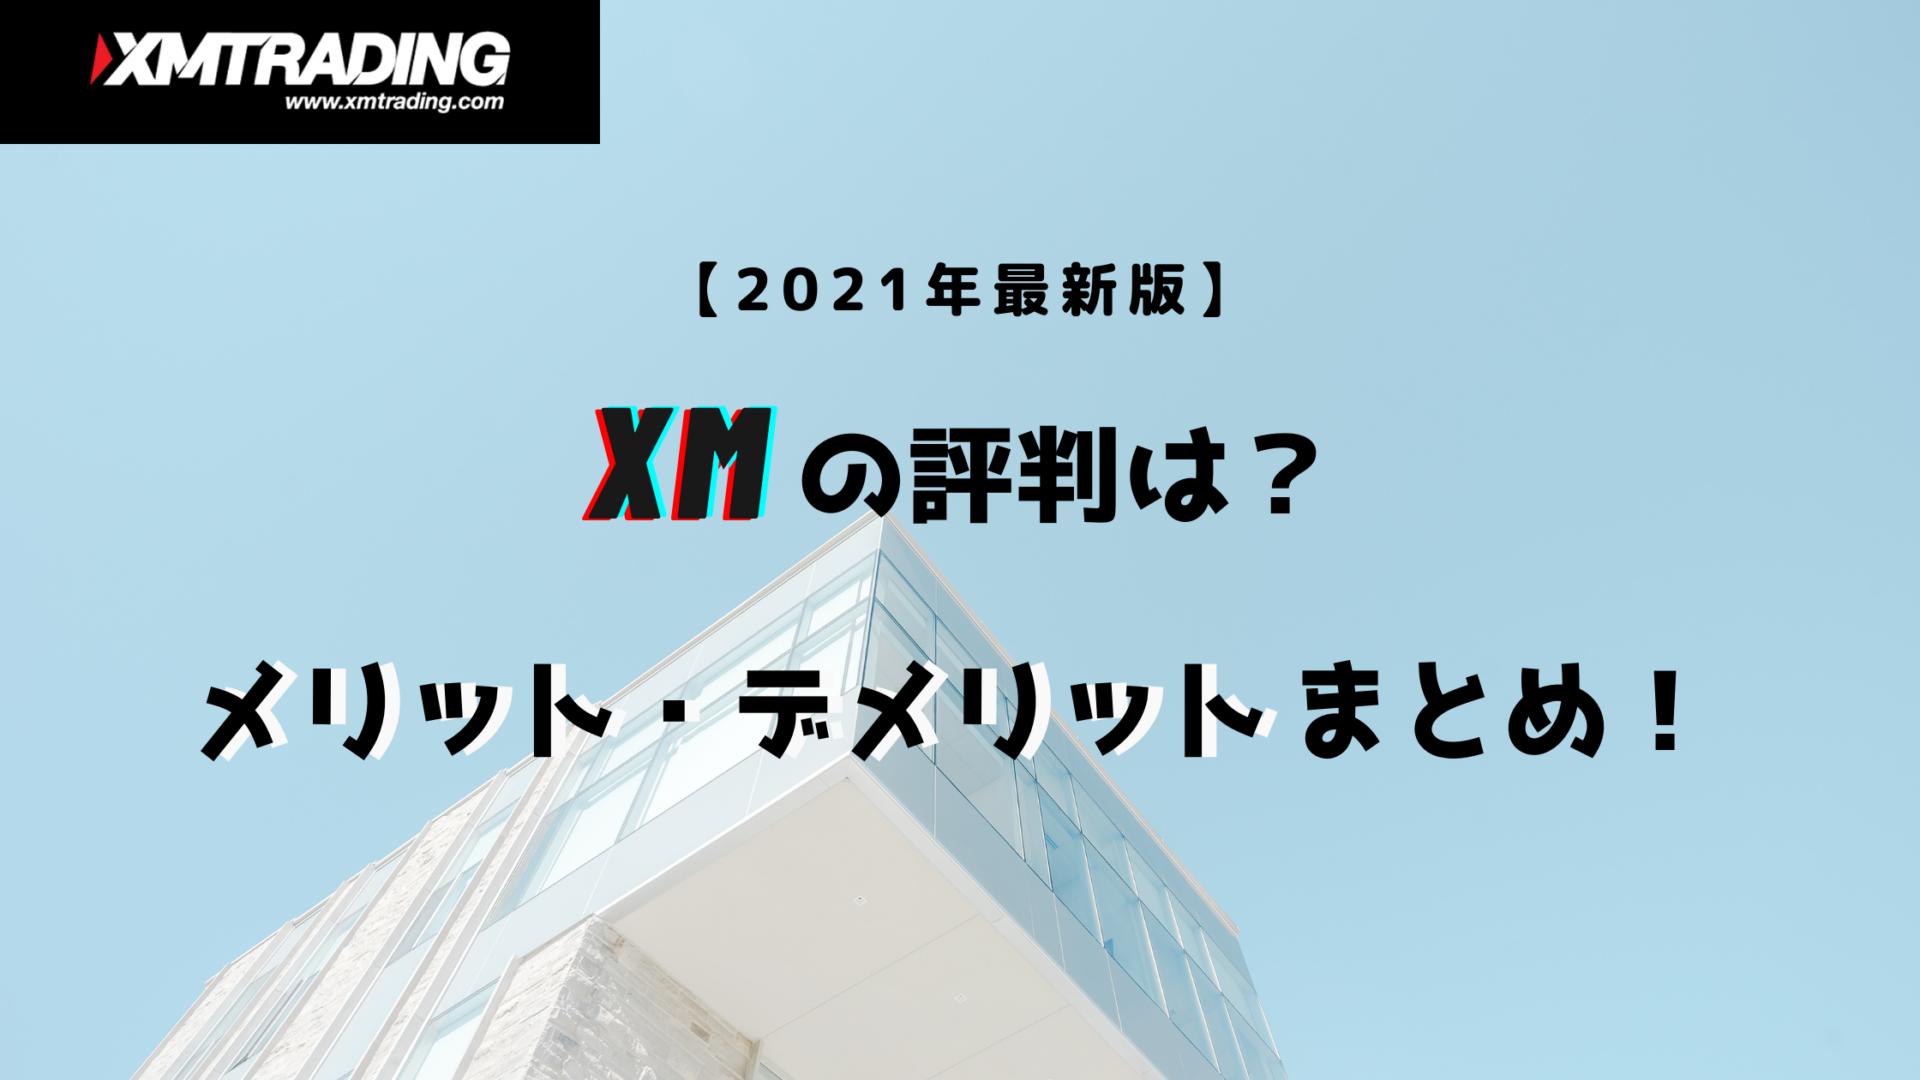 XM(XMTrading)の評判は?11つの長所と8つの短所